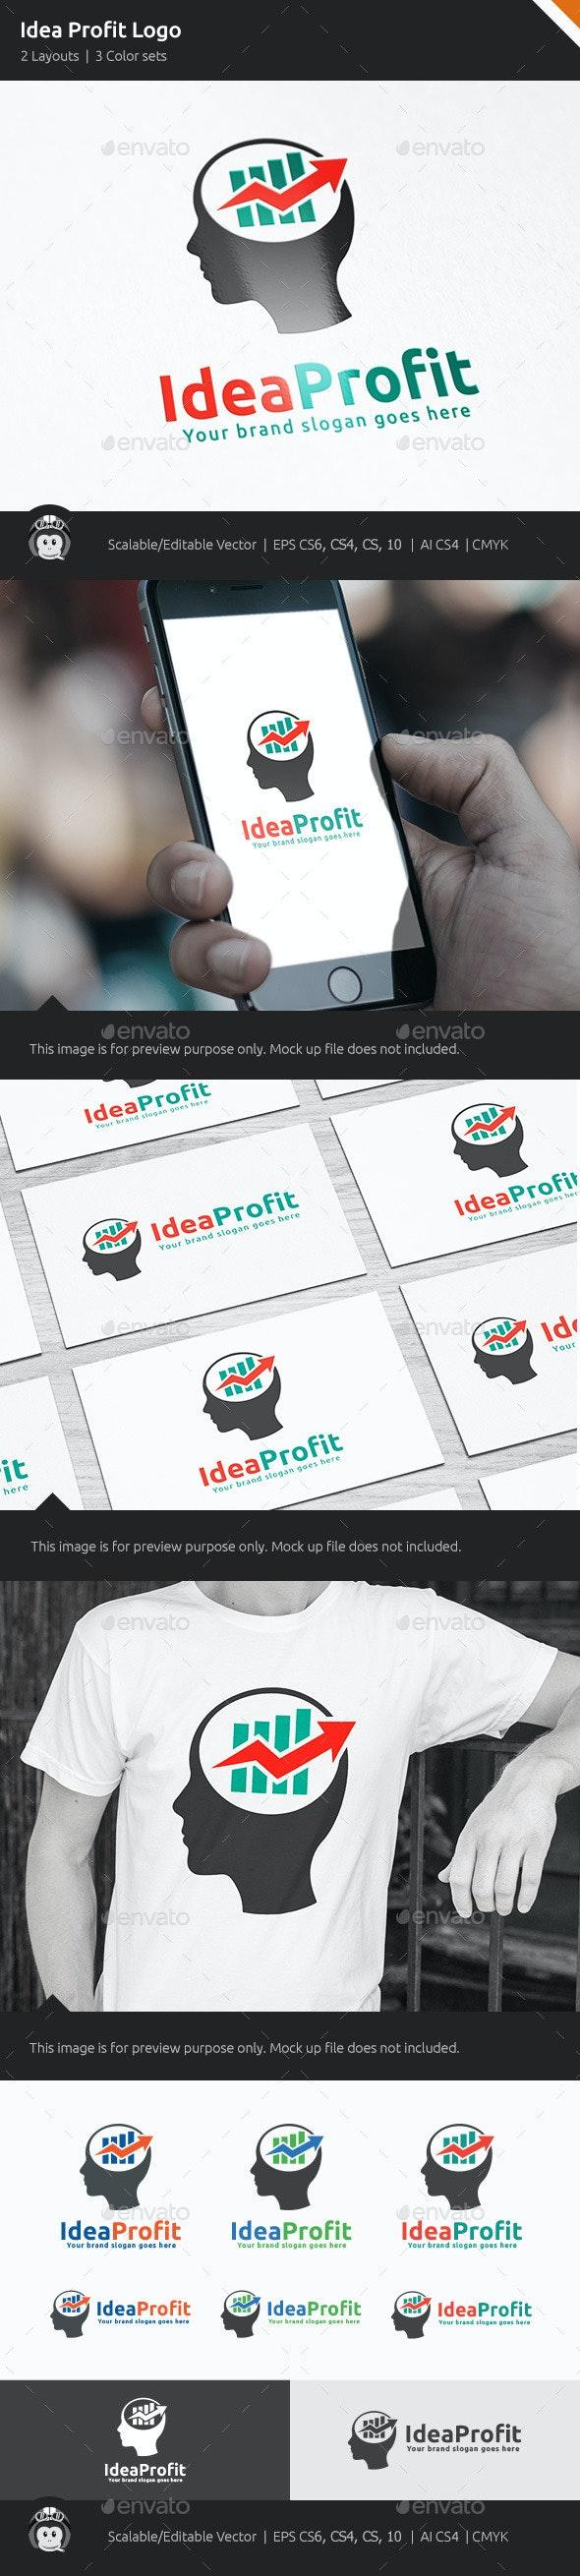 Idea Profit Marketing Logo - Vector Abstract